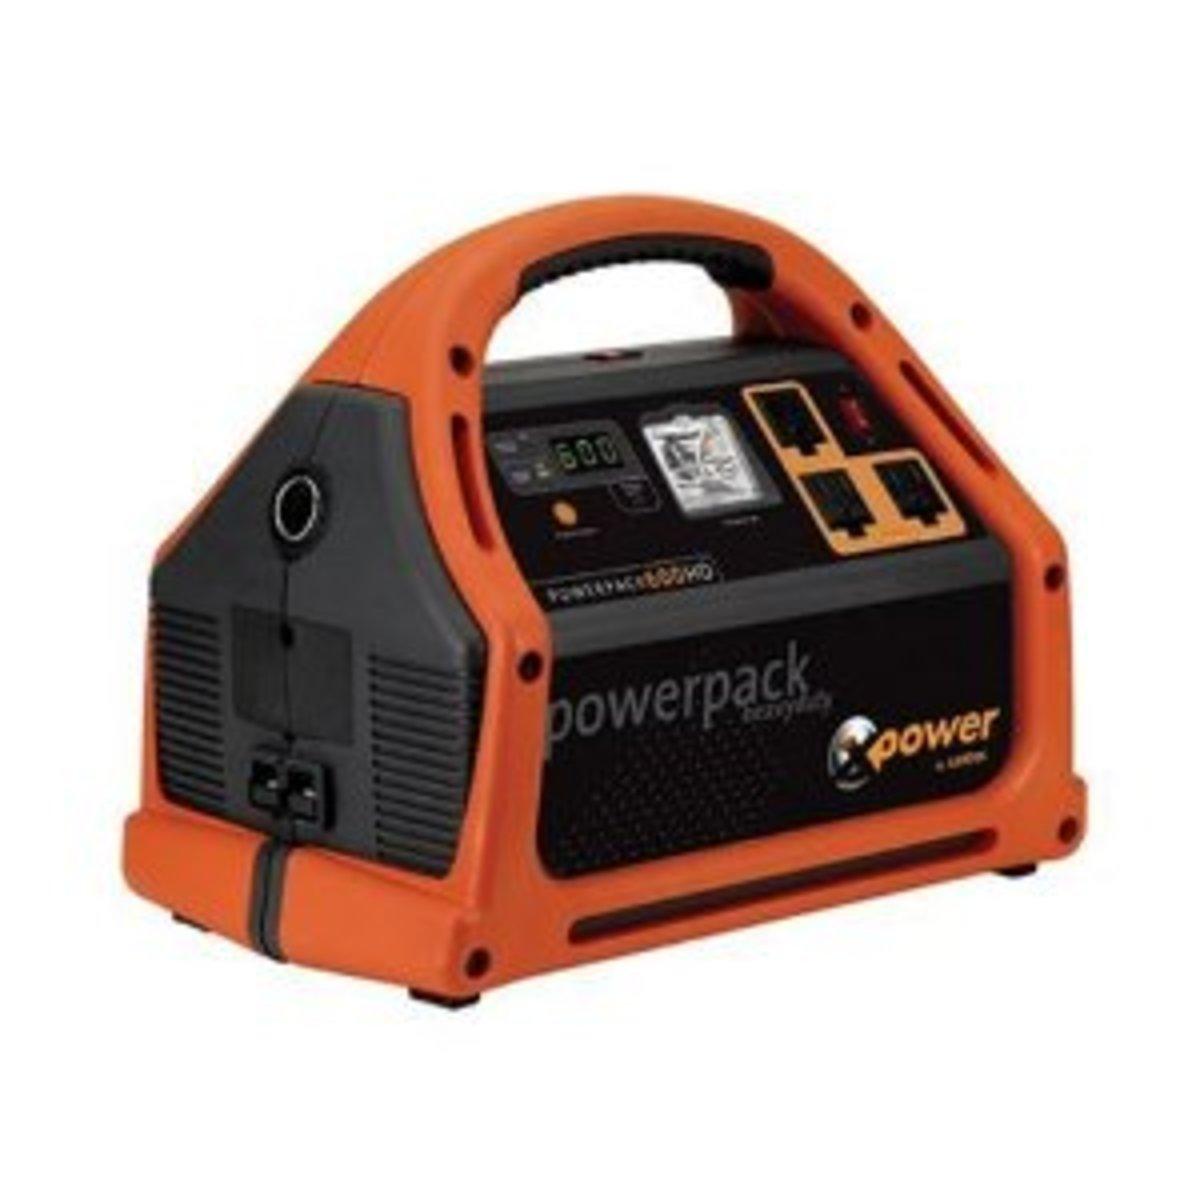 Xantrex Powerpack 600 Watt Jumpstarter, Power Inverter and Backup Power Source